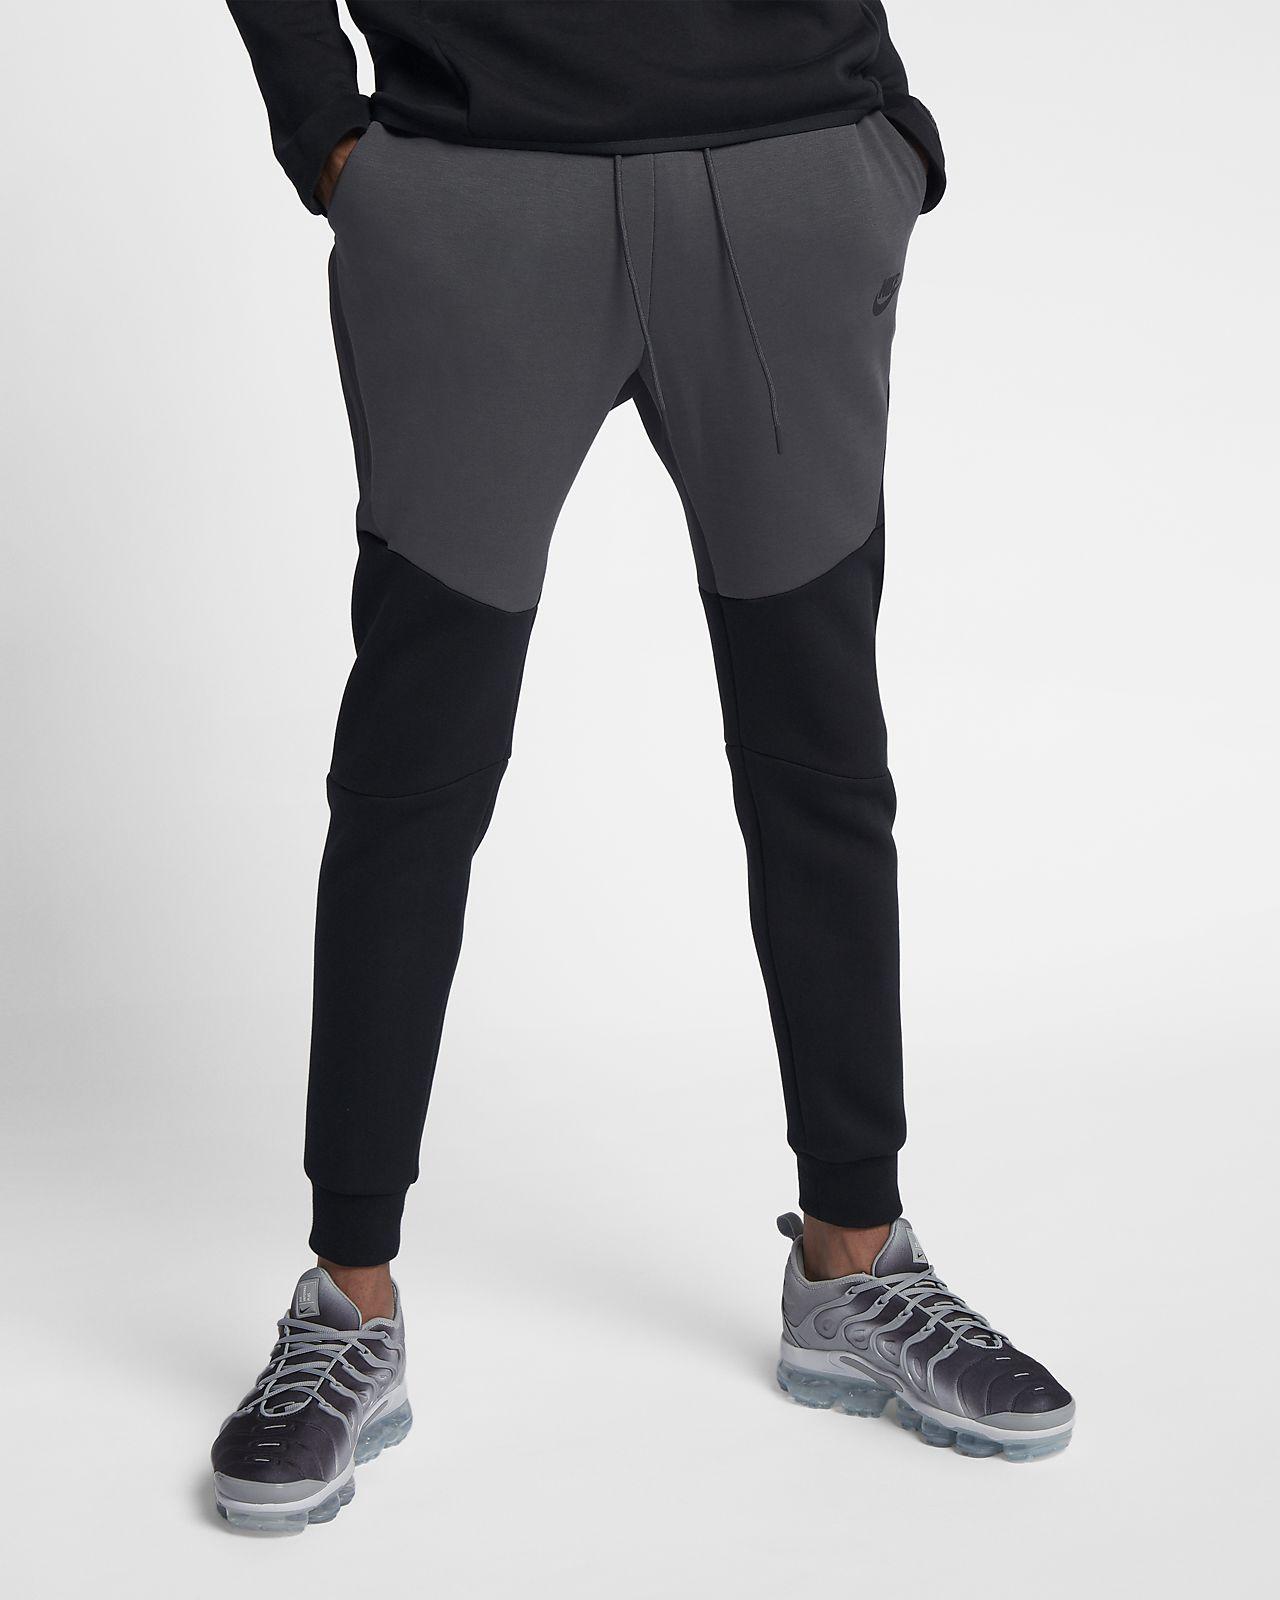 info for dad74 bf93f 999 kr. Low Resolution Joggingbyxor Nike Sportswear Tech Fleece för män  Joggingbyxor Nike Sportswear Tech Fleece för män